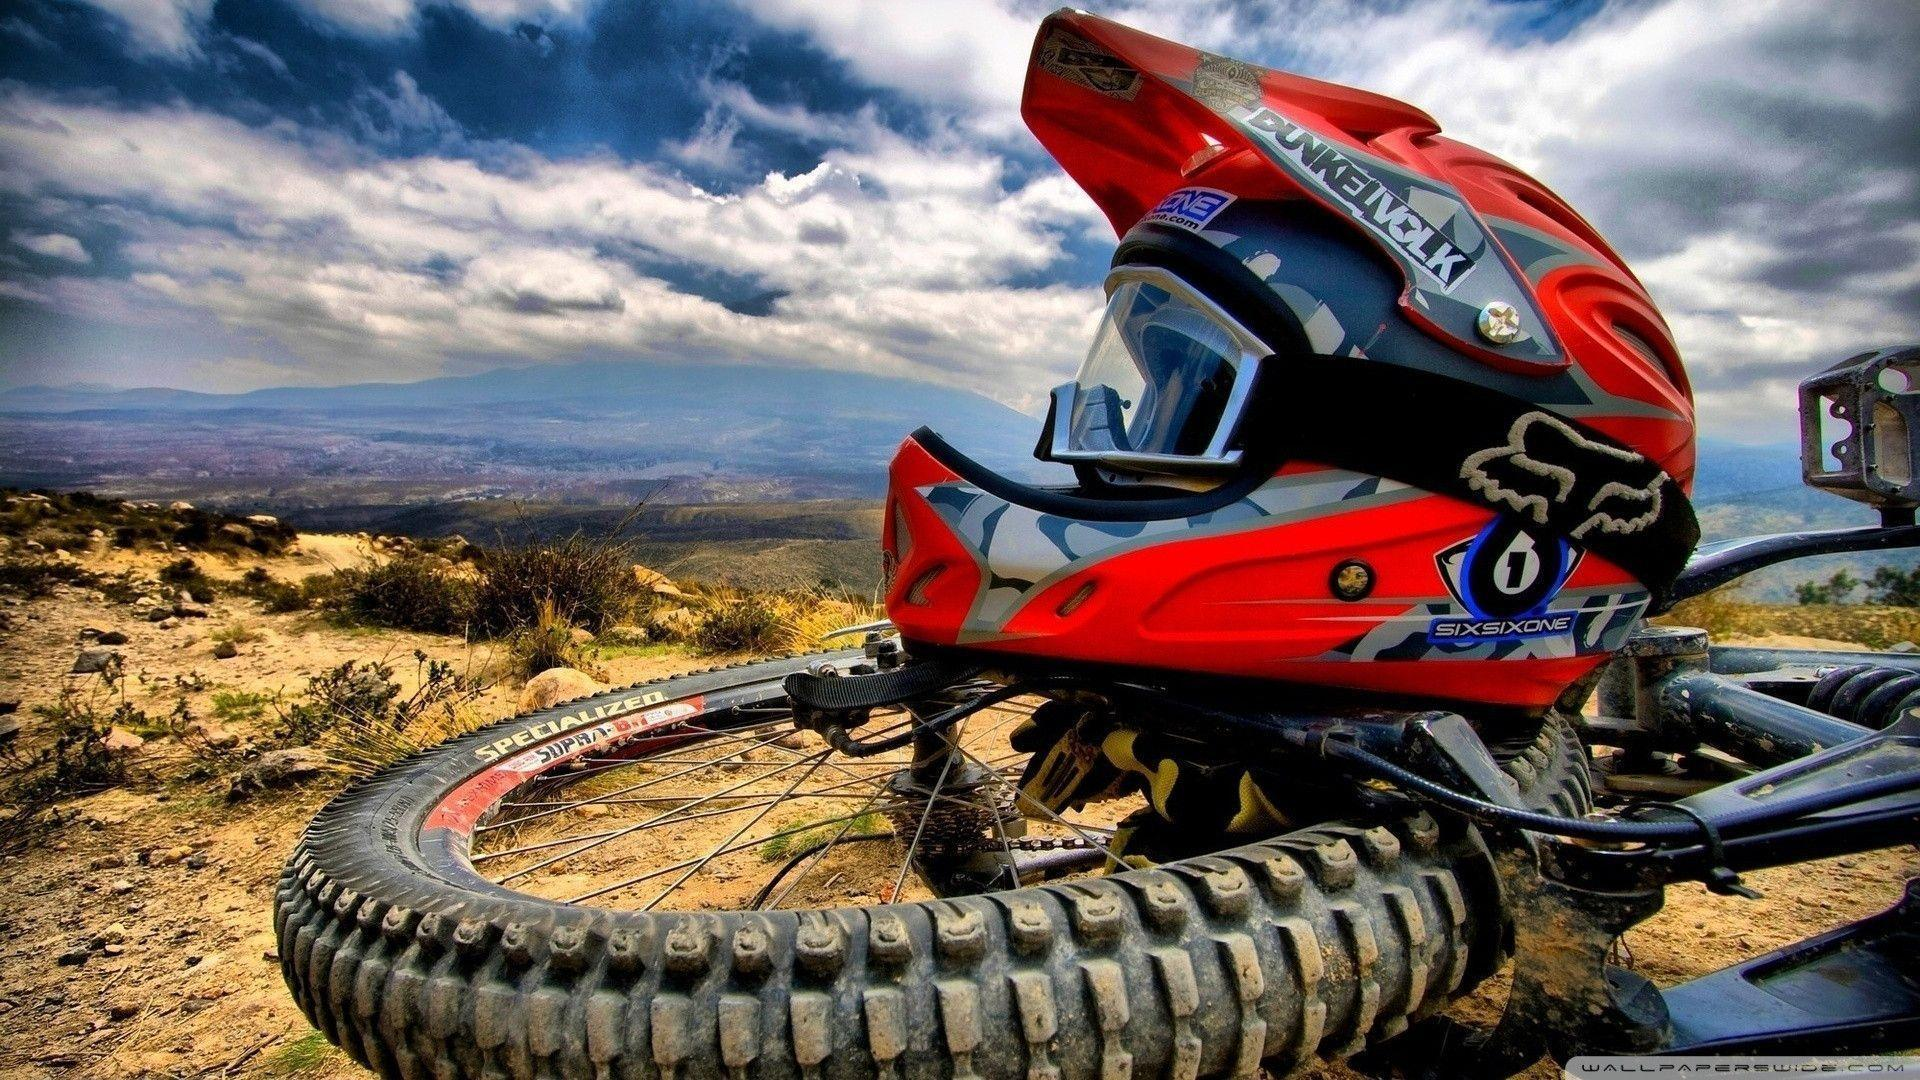 Dirt Bikes Hd Wallpapers: Motocross Wallpapers 2015